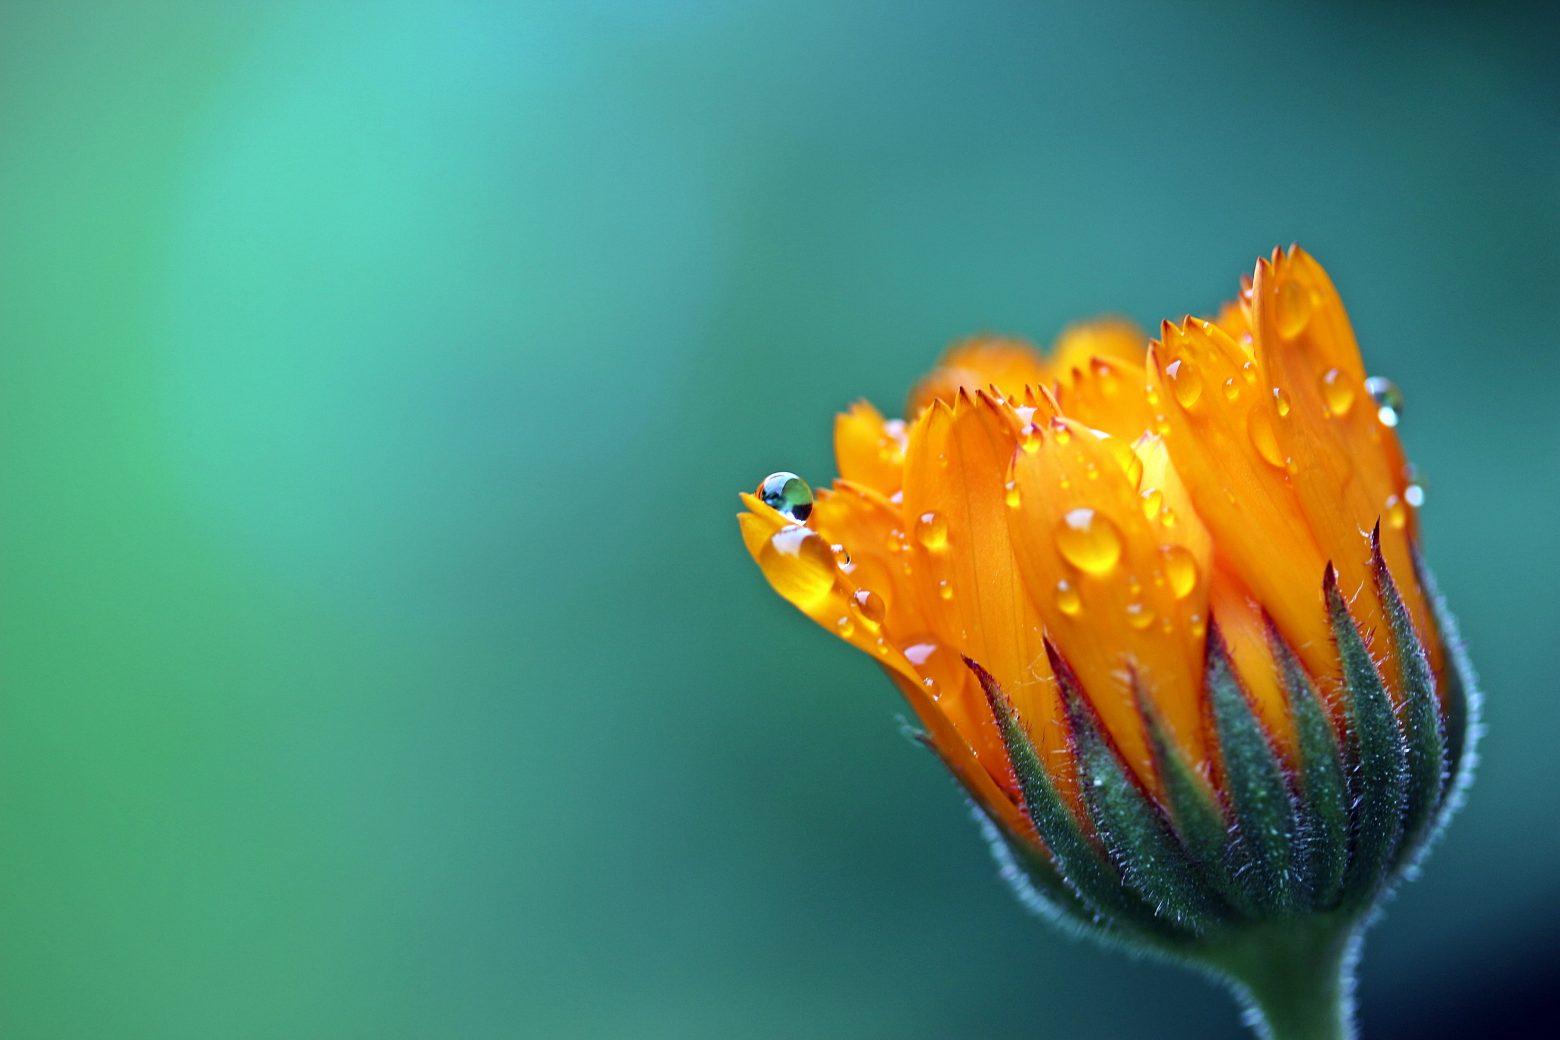 marigold-1568646